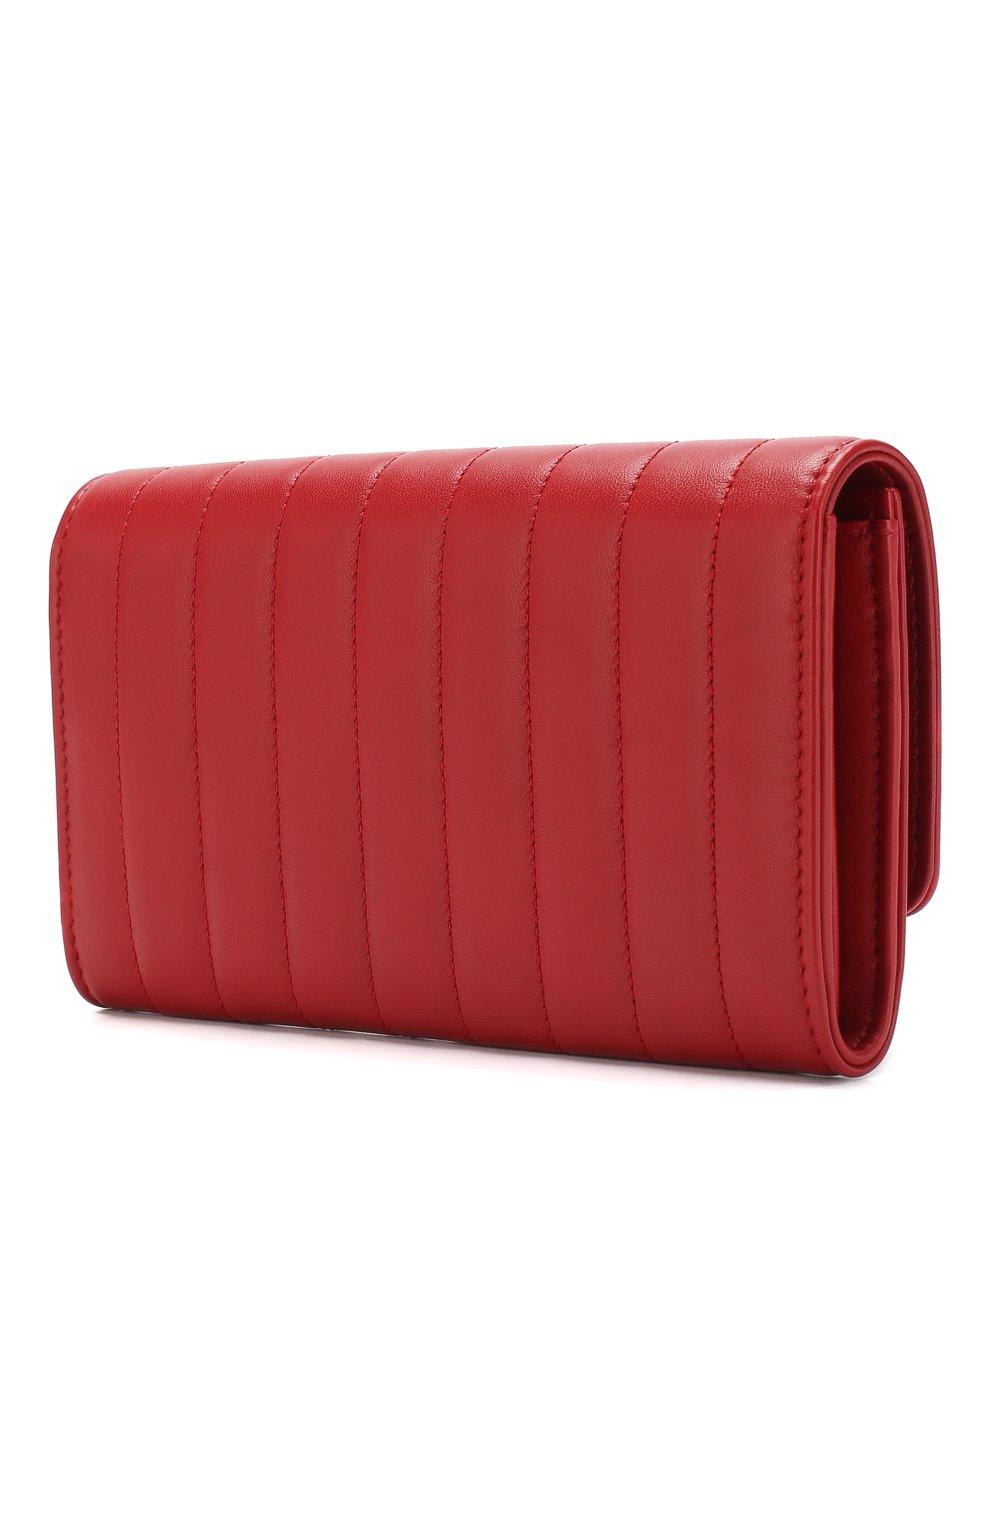 Кожаный кошелек Vicky с клапаном | Фото №2